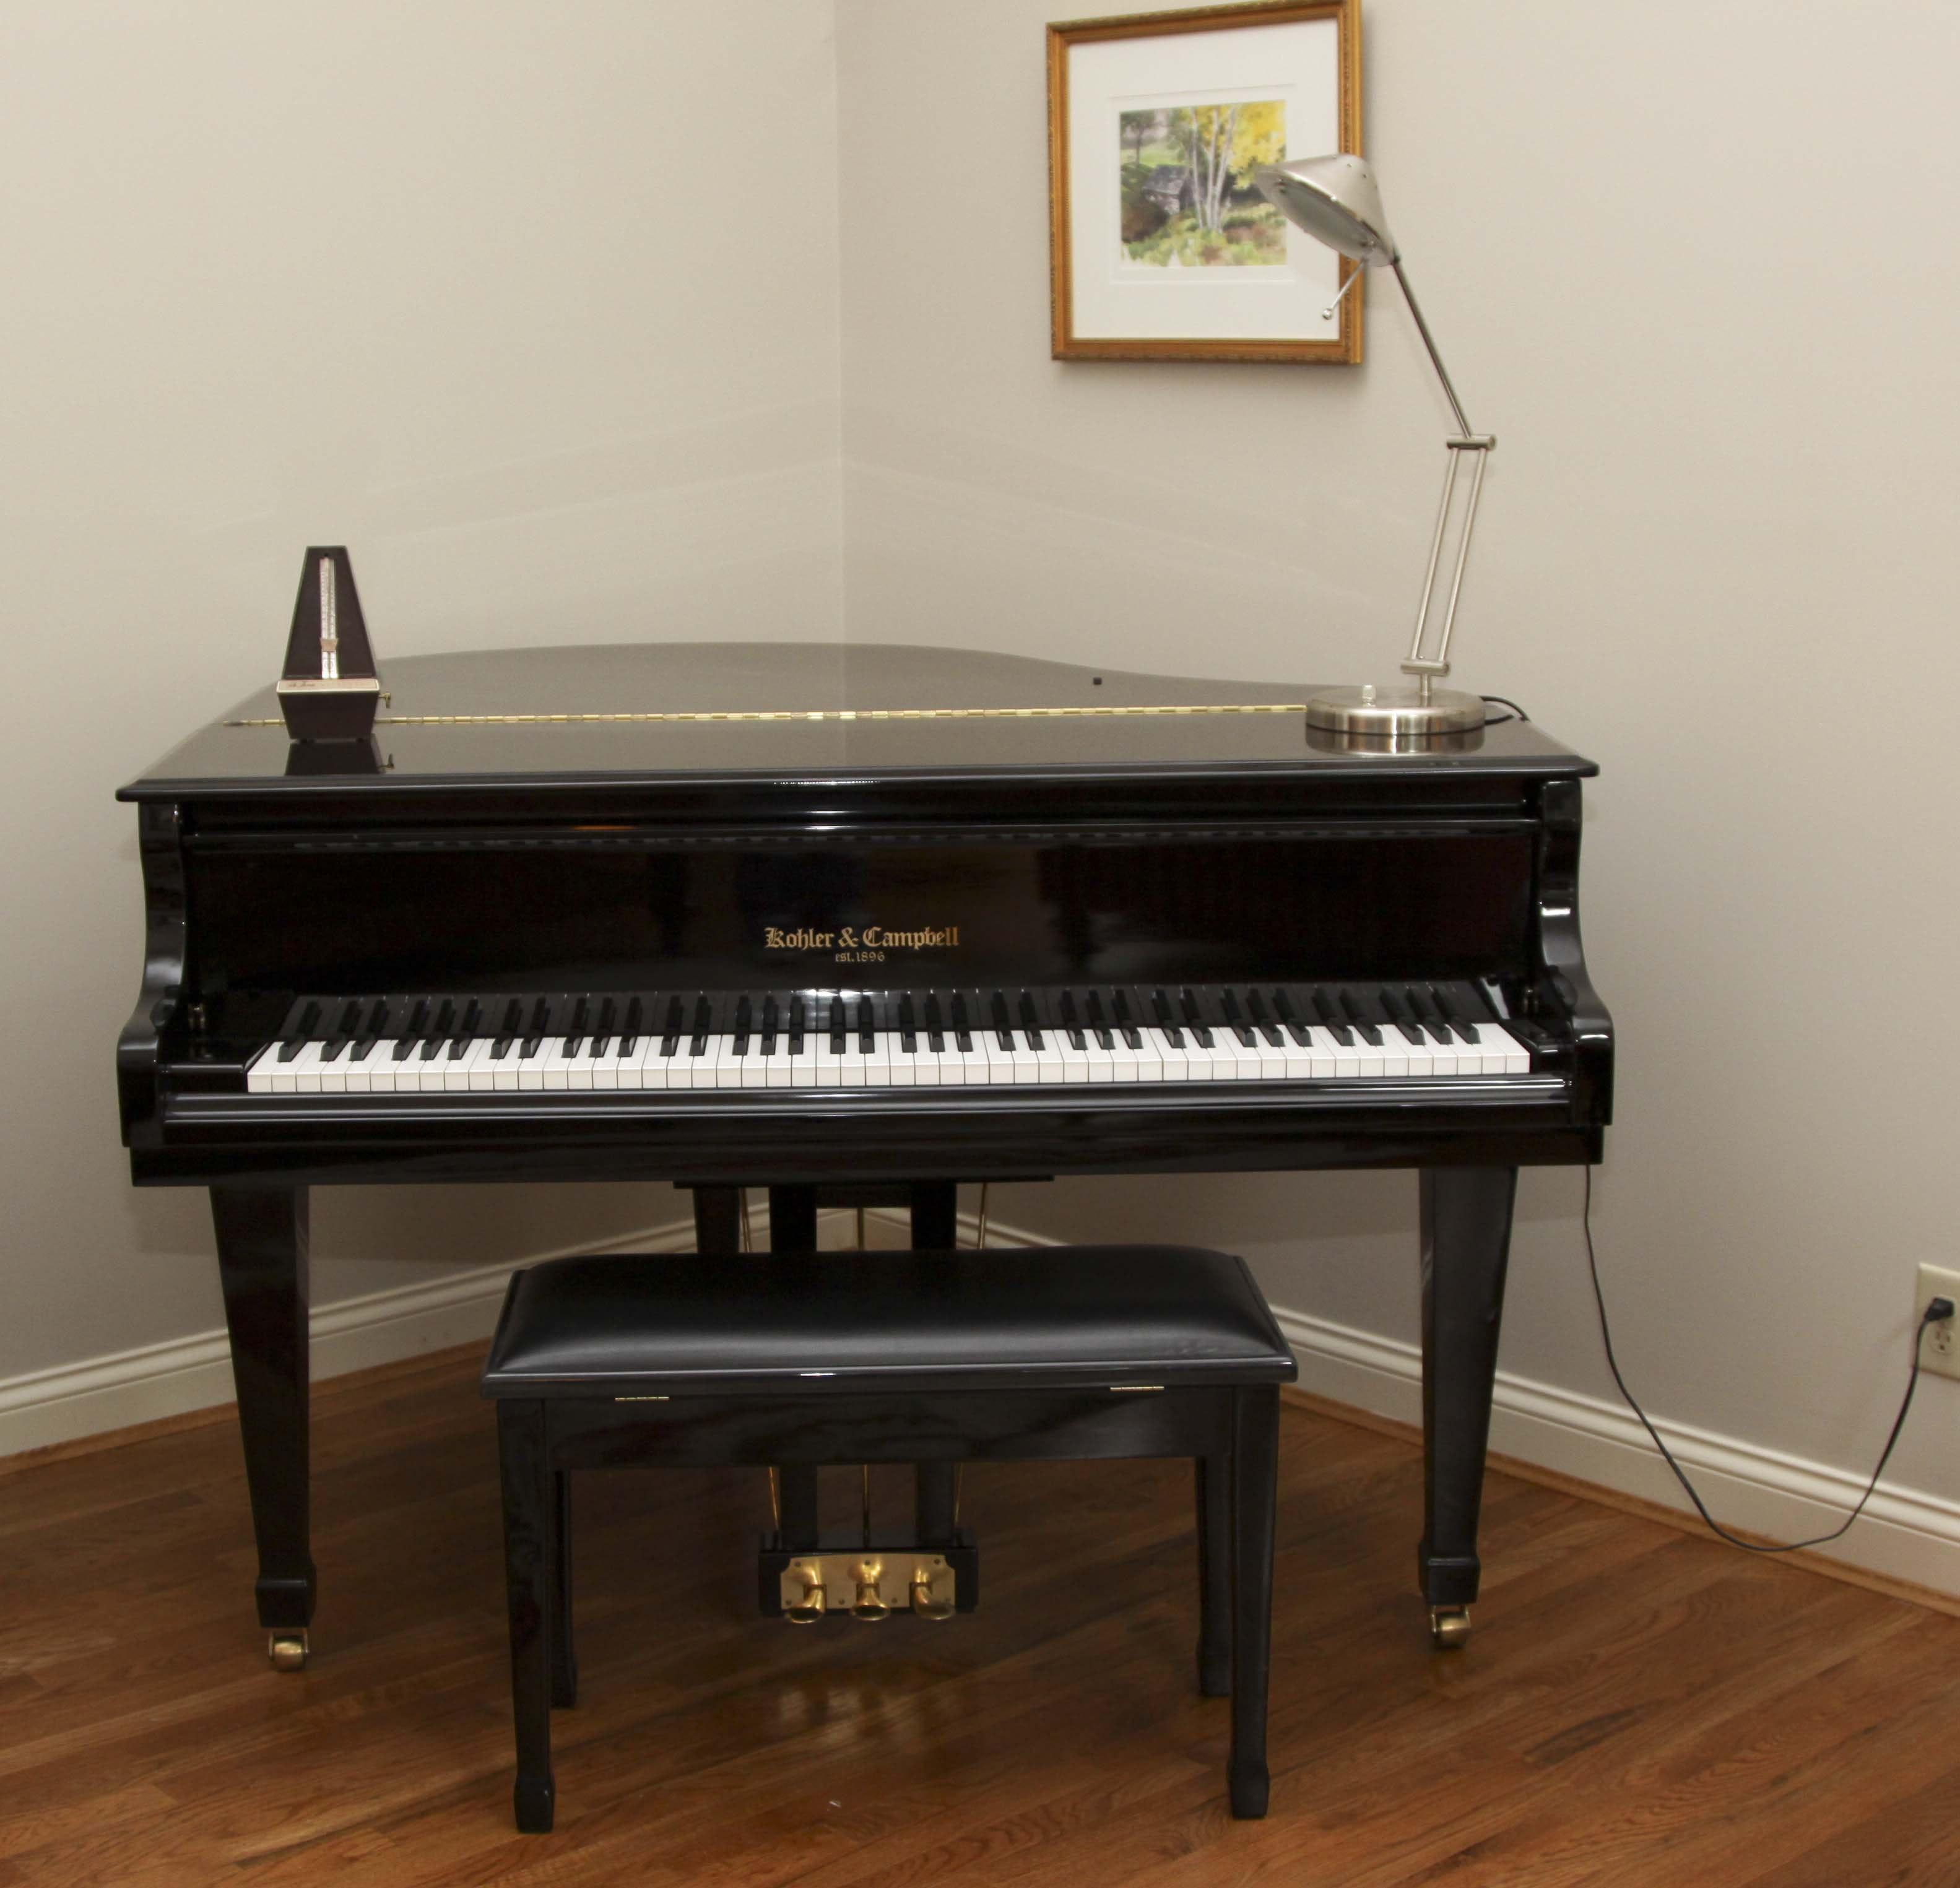 Kohler & Campbell Baby Grand Piano, Lamp, and Seth Thomas Metronome